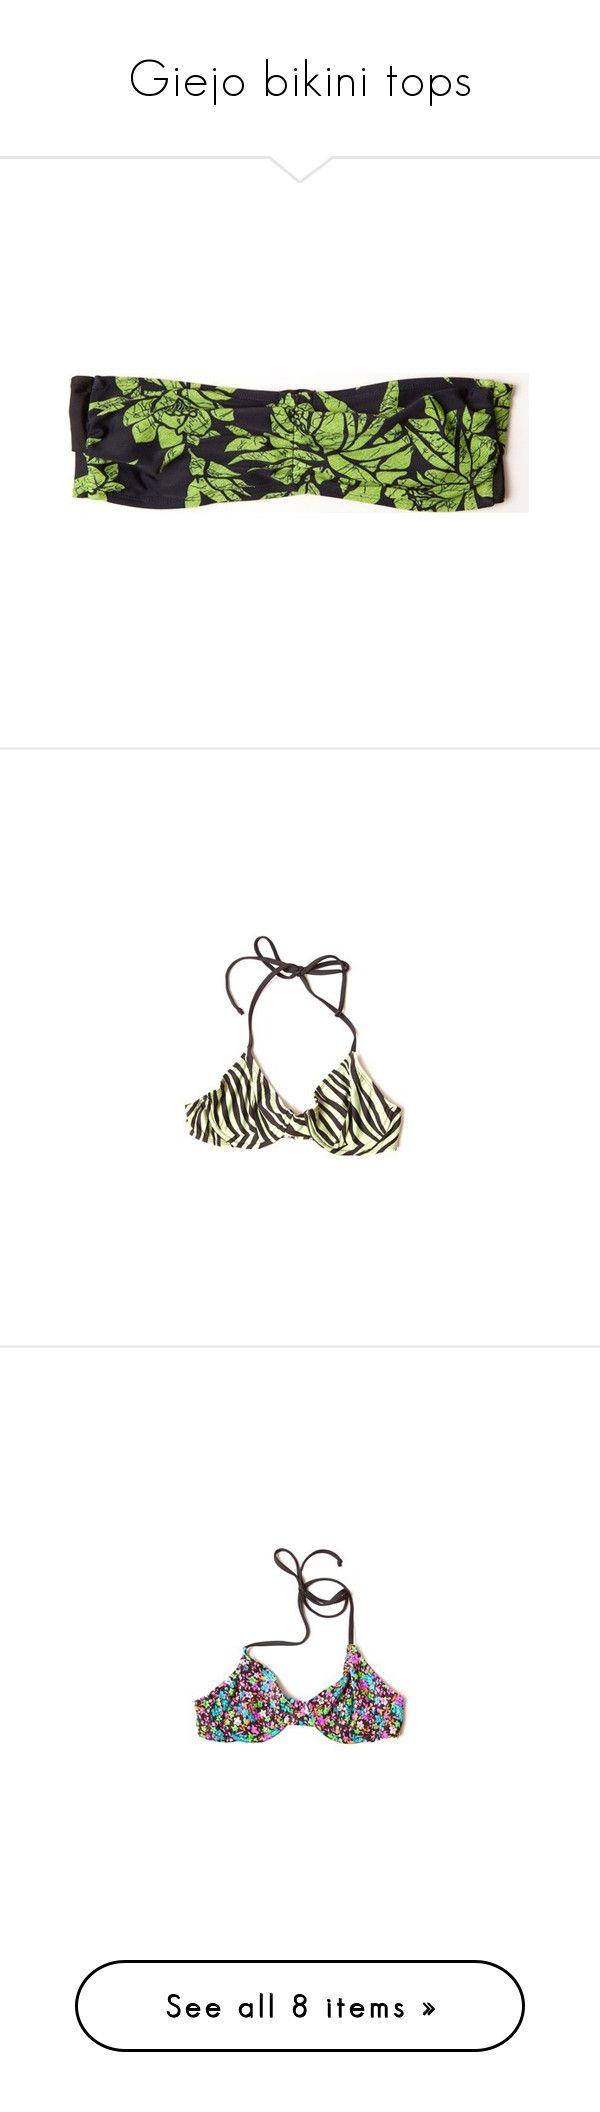 """Giejo bikini tops"" by runway2street ❤ liked on Polyvore featuring bikini, giejo, runway2street, swimwear, bikinis, sexy swimsuits, high waisted swimsuit, high waisted swim suit, halter bikini top and retro swimsuit"